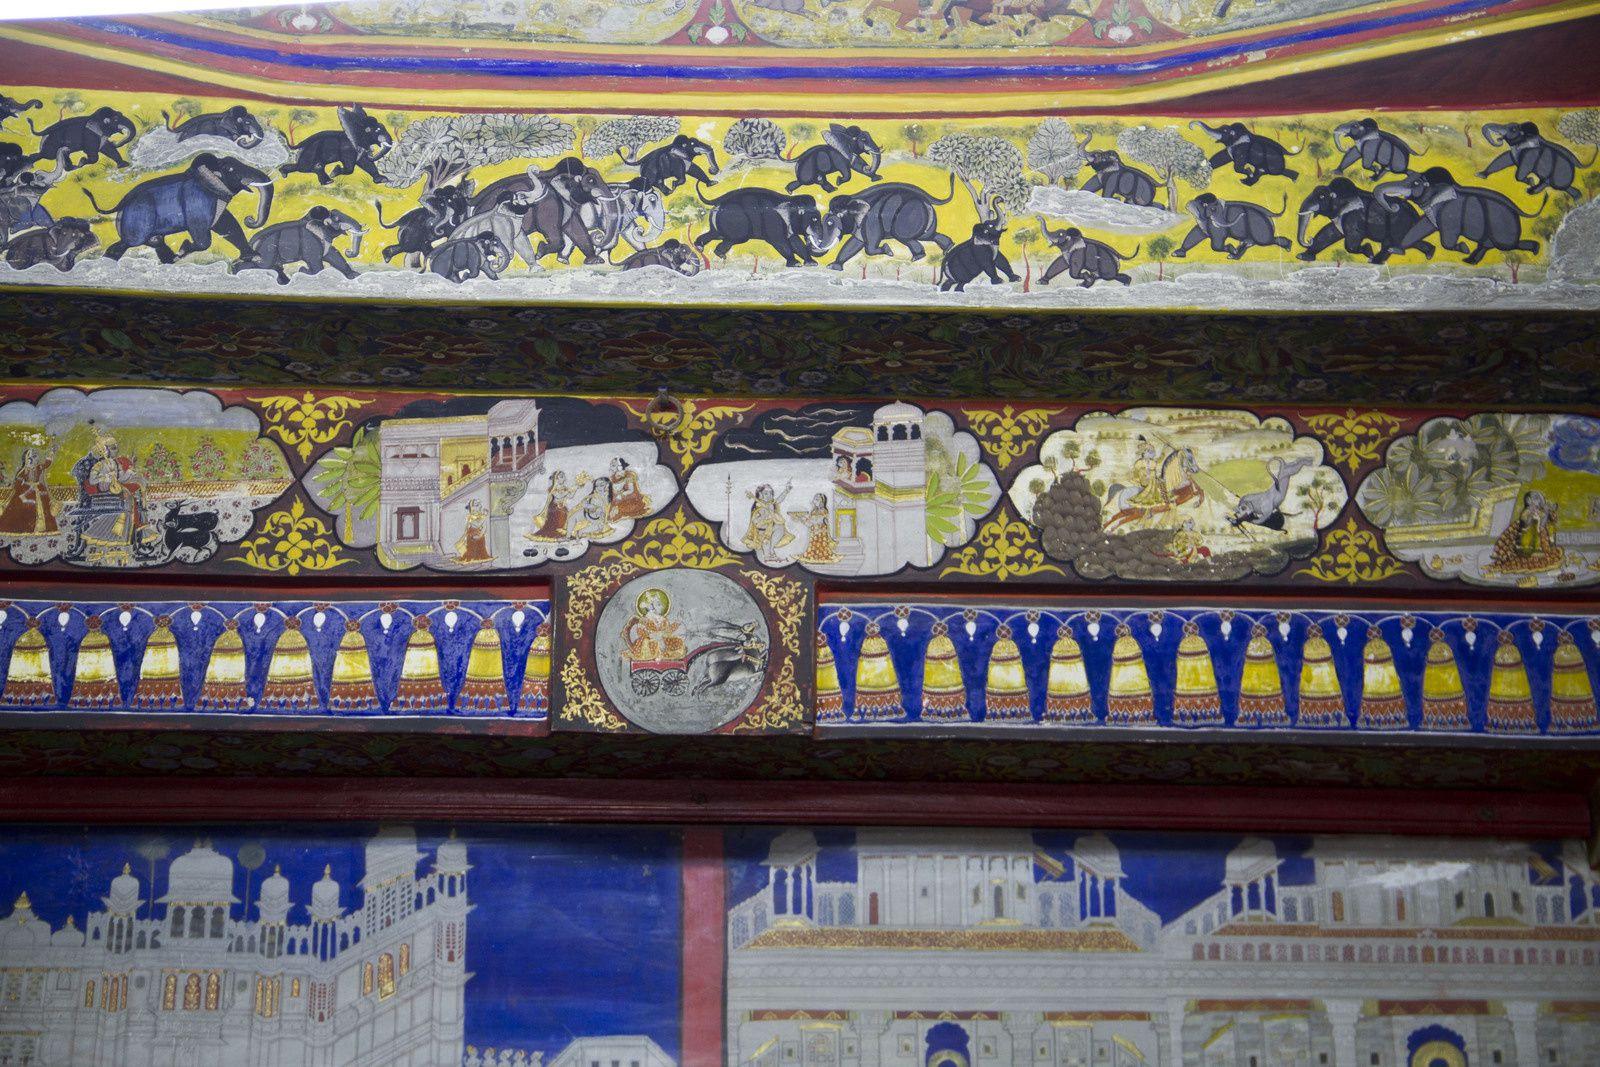 Vues du Badi Mahal, des peintures ... et d'une perruche